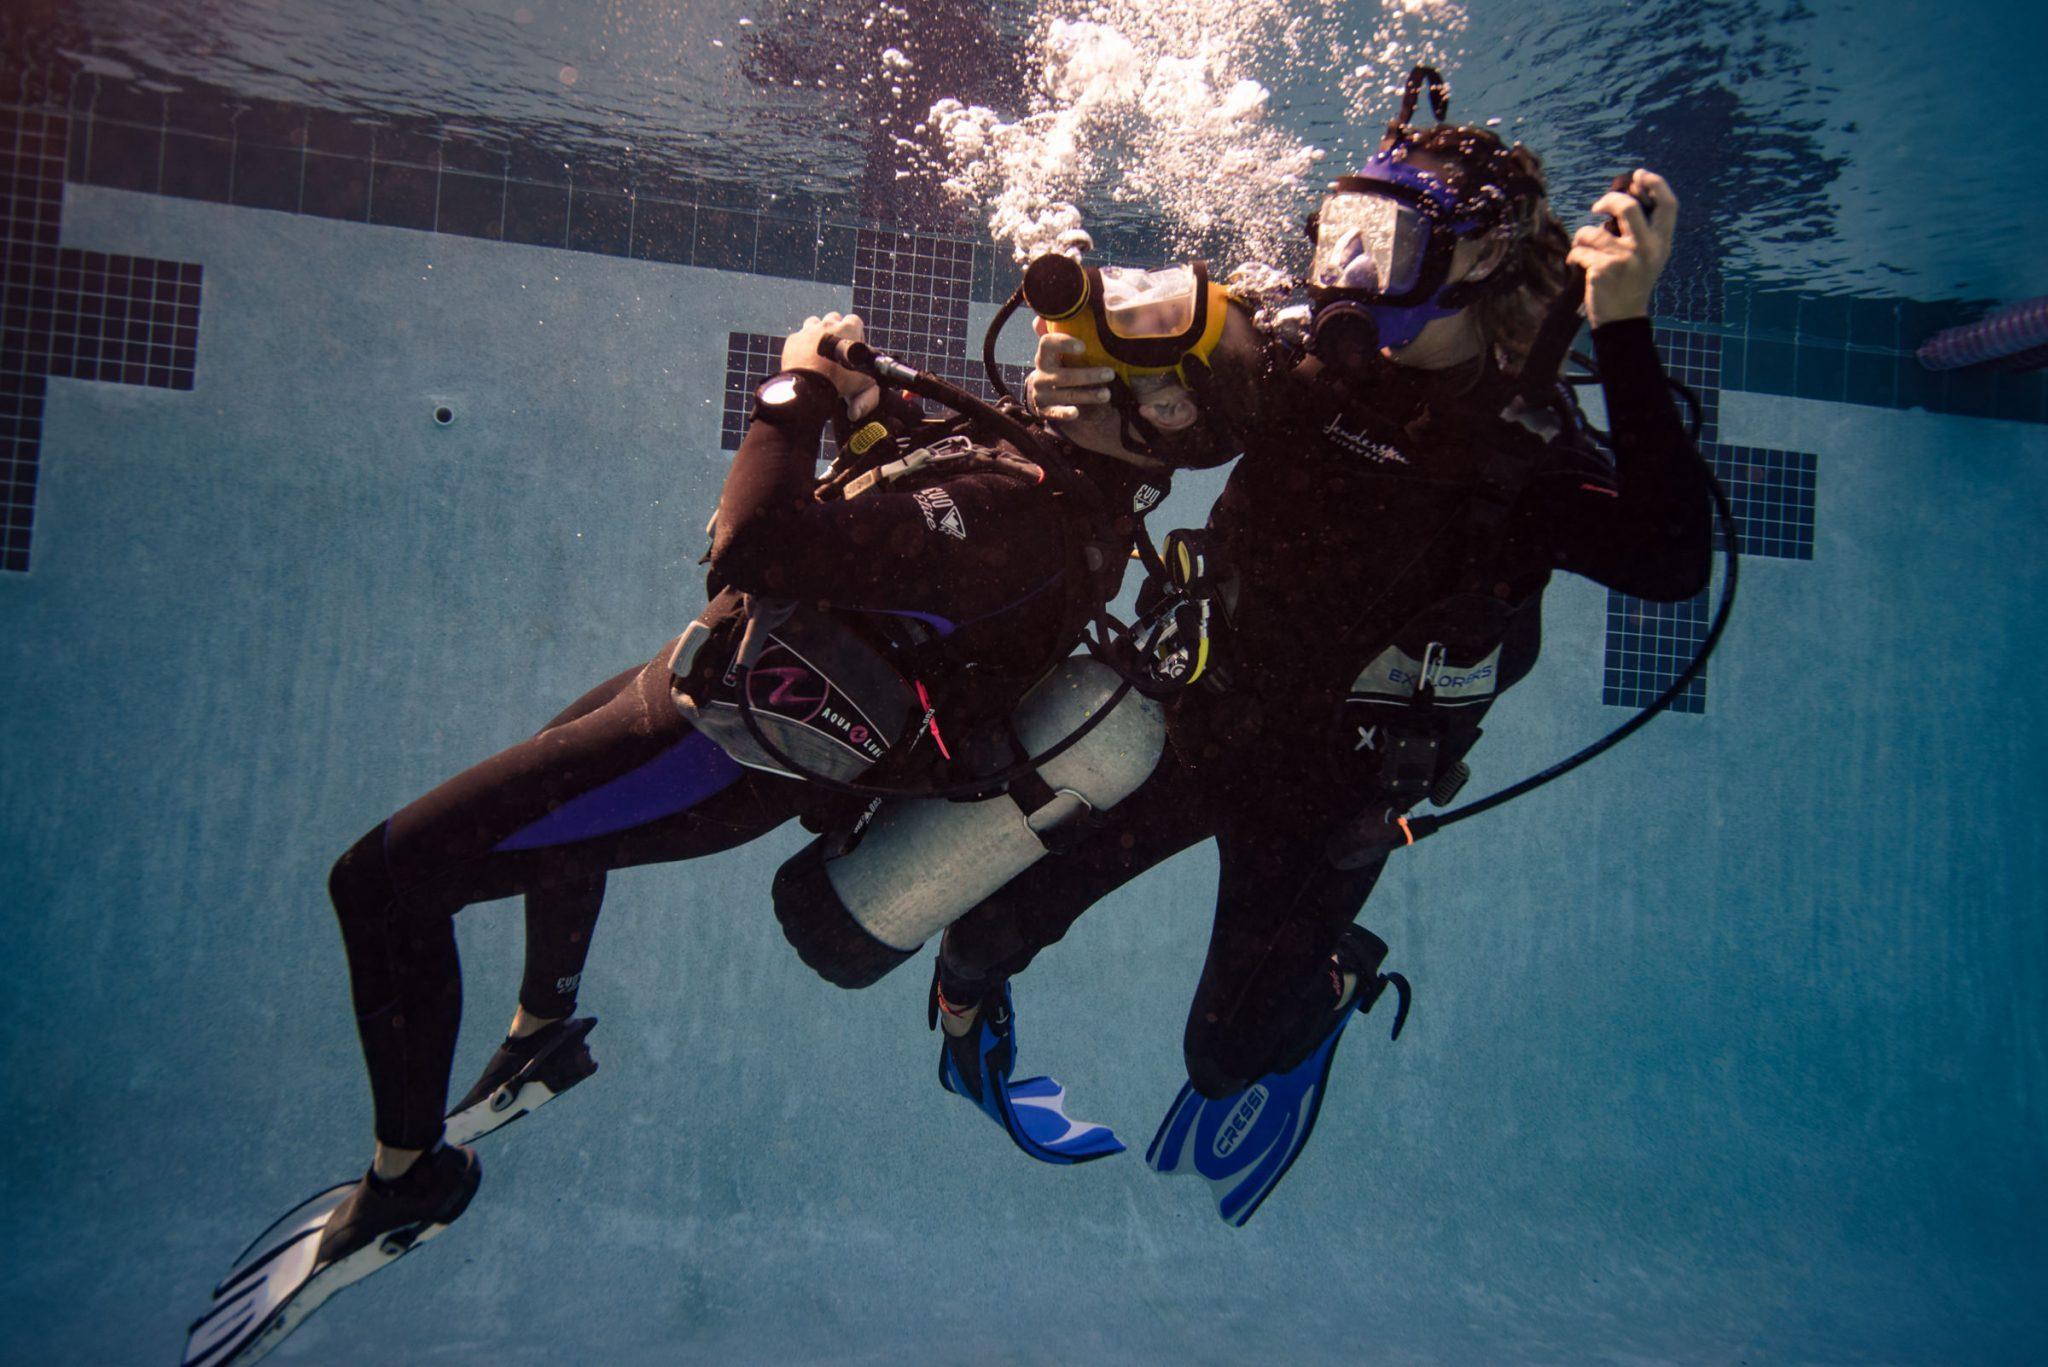 3 people scuba diving underwater